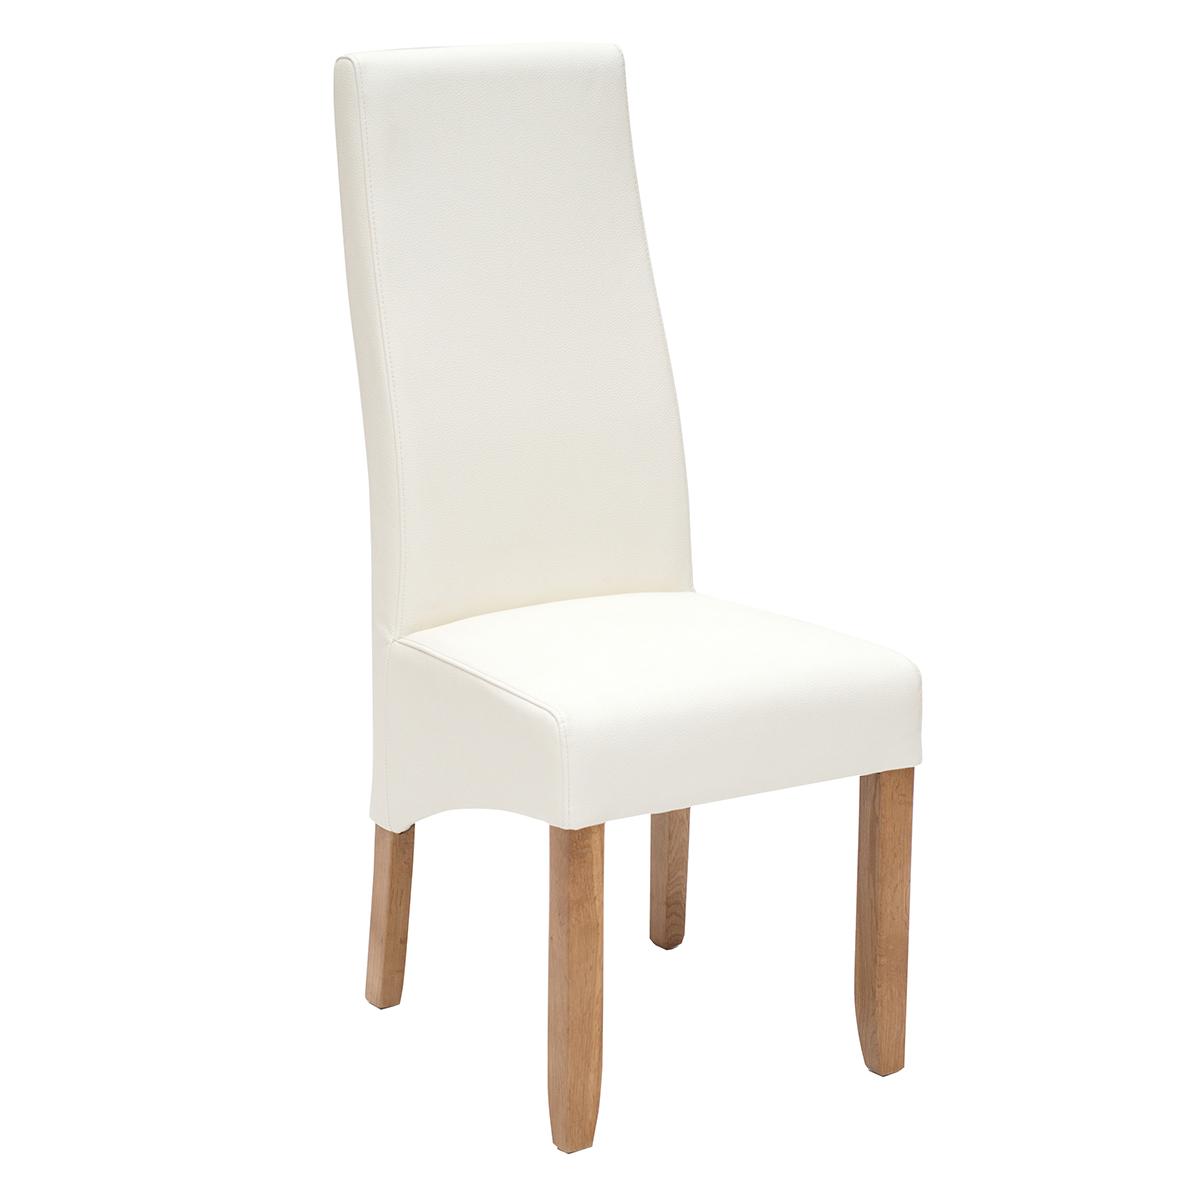 Wavey Dining Chair Scs Endurance Illusion White Willis